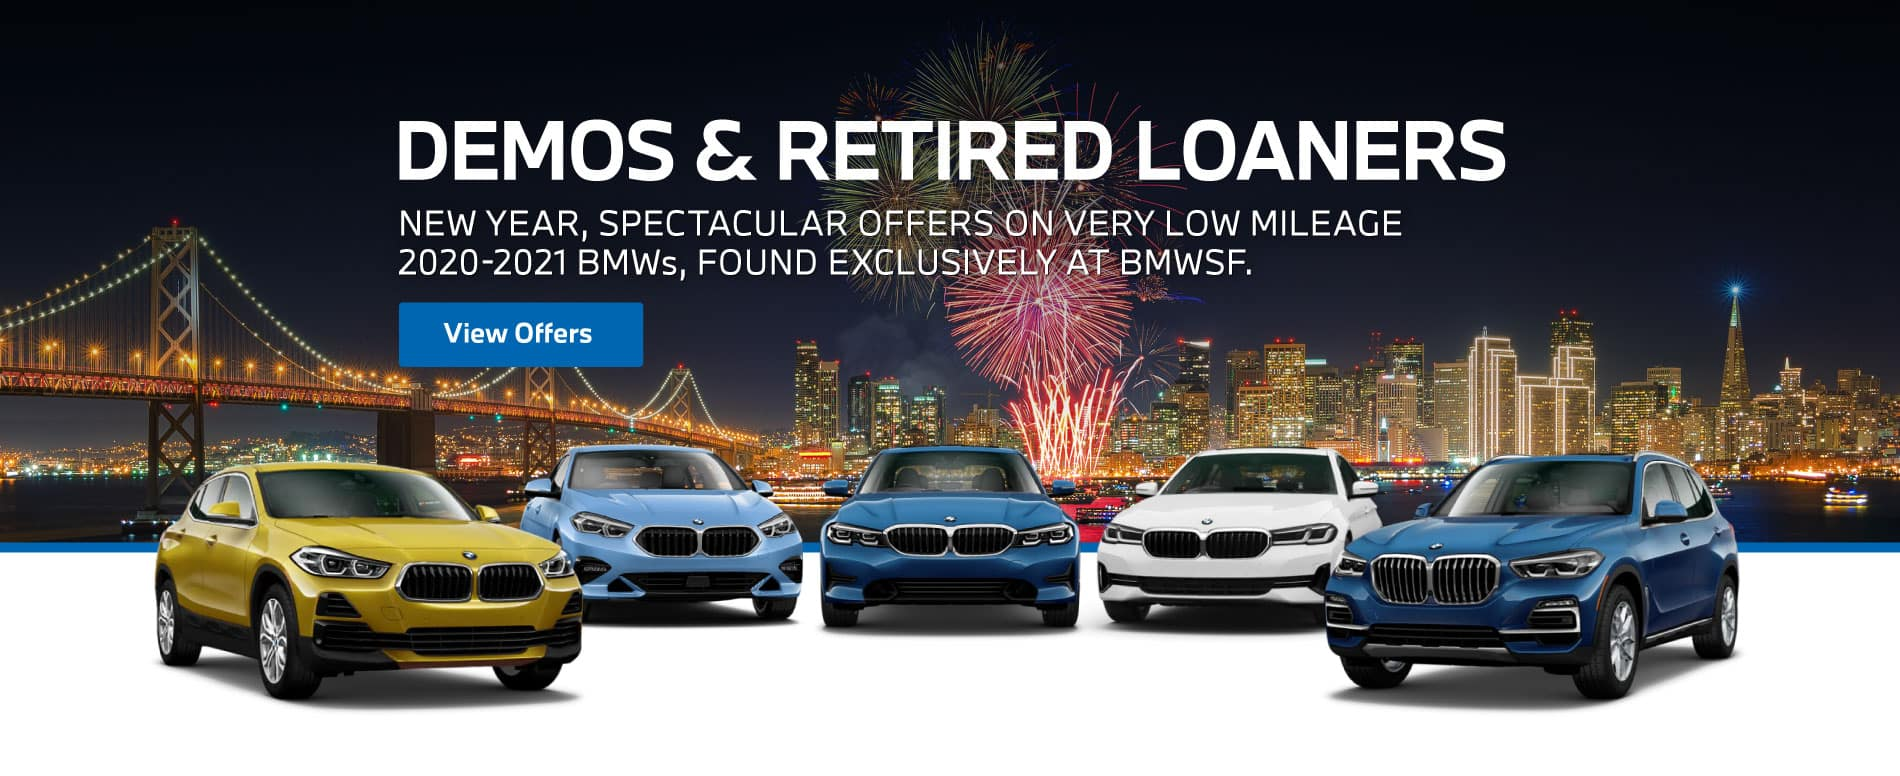 2021-01_BMWSF-LoanersDemos